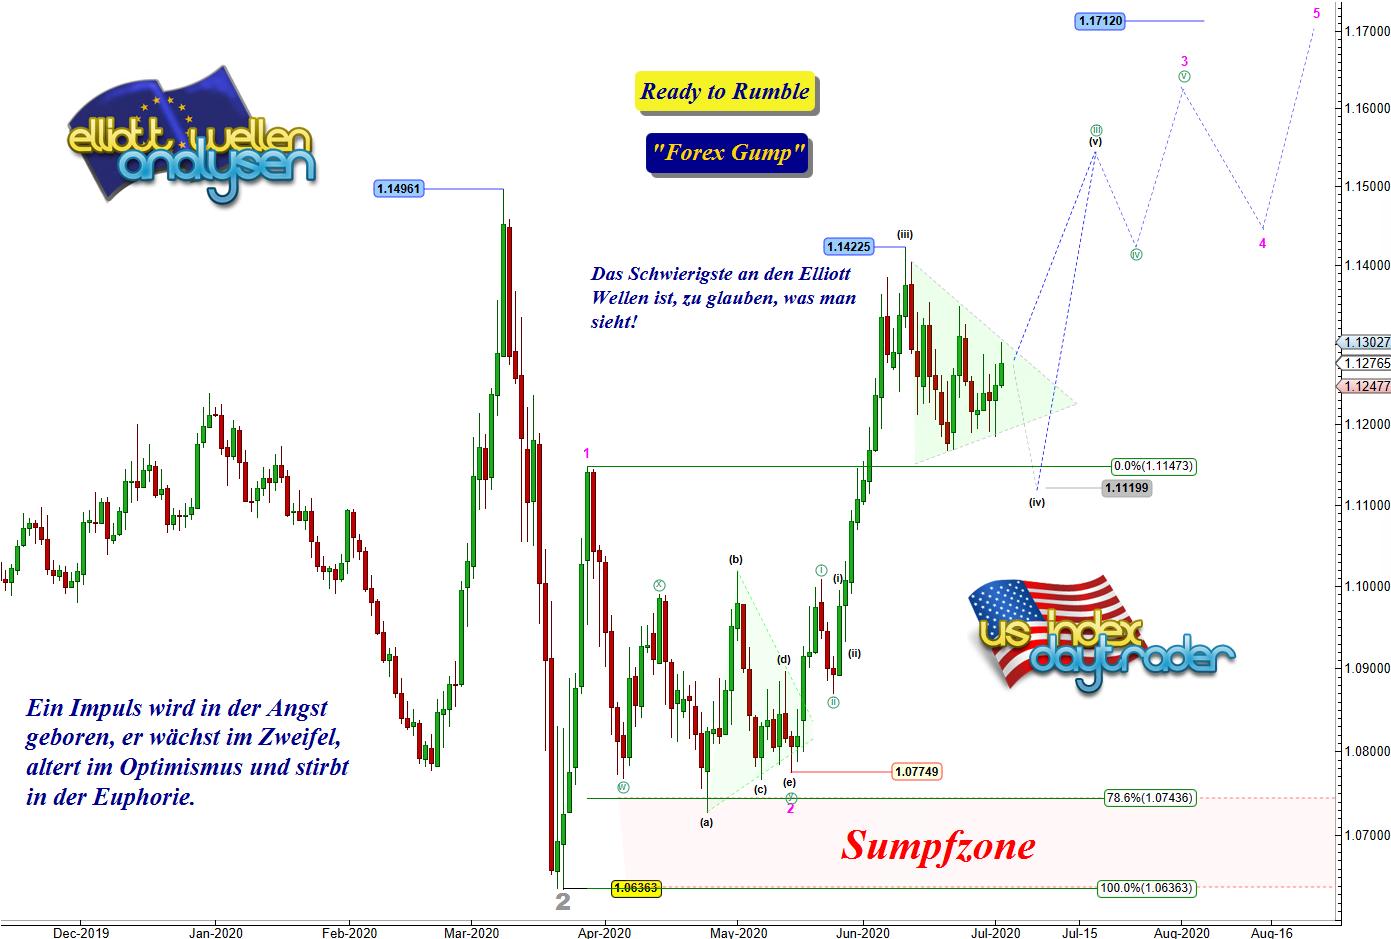 EW-Analyse-EUR-USD-Die-letzte-Chance-Chartanalyse-André-Tiedje-GodmodeTrader.de-1